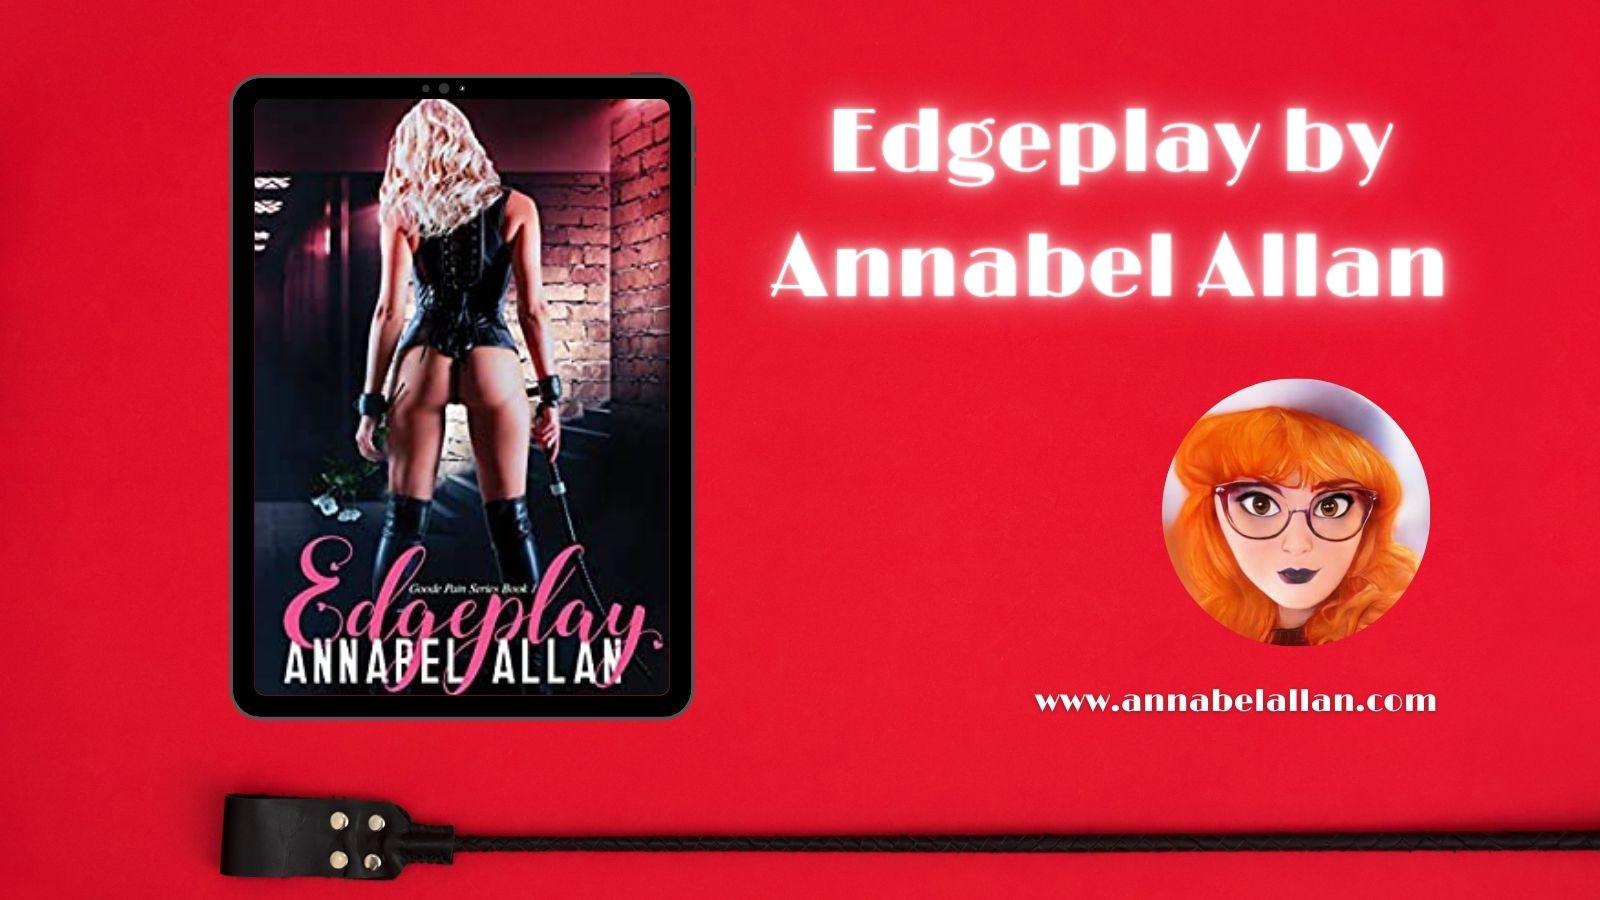 Edgeplay by Annabel Allan